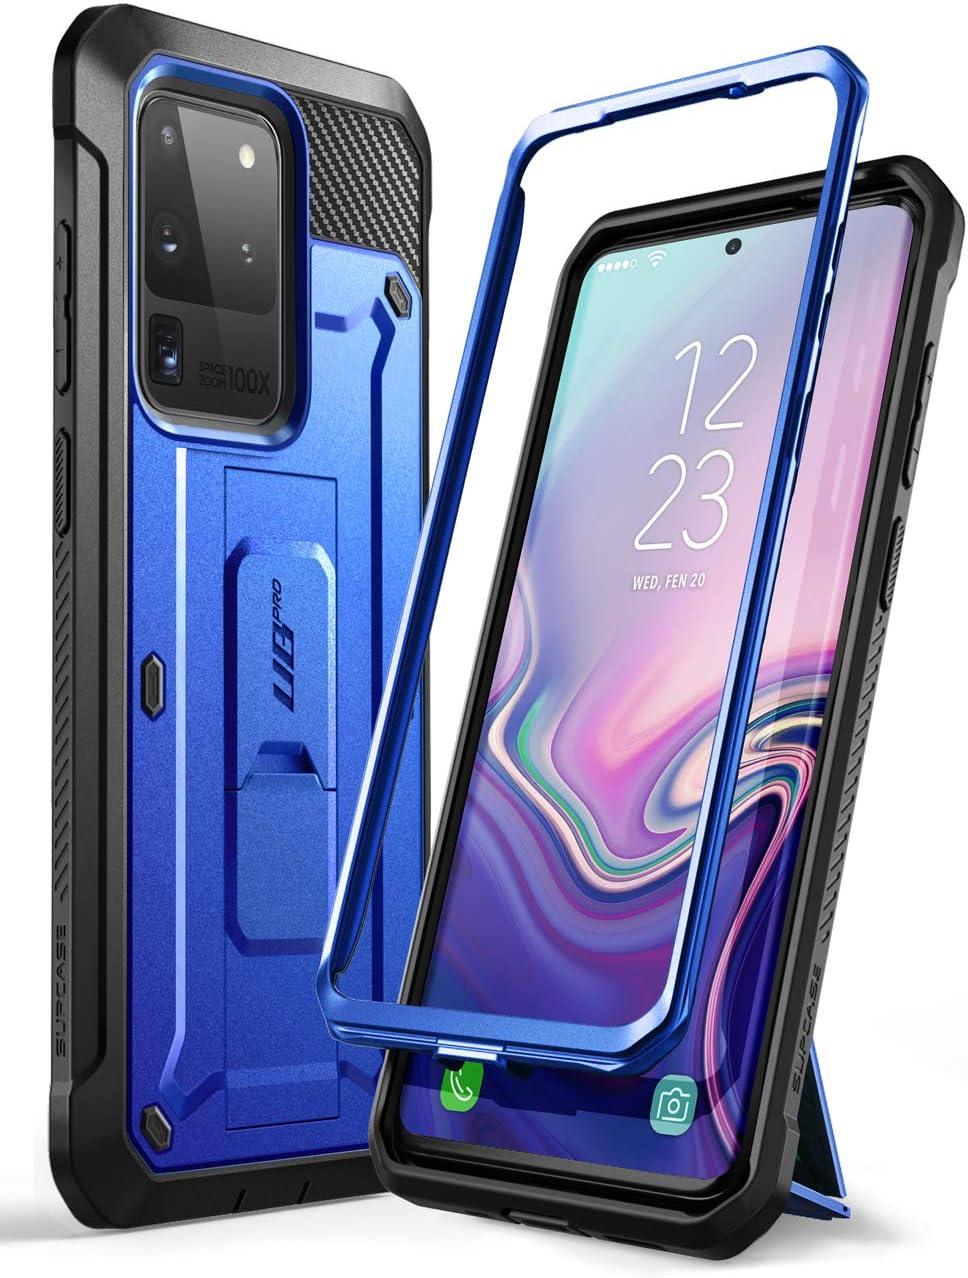 Funda Cuerpo Completo Samsung S20 Ultra Supcase ub pro azul